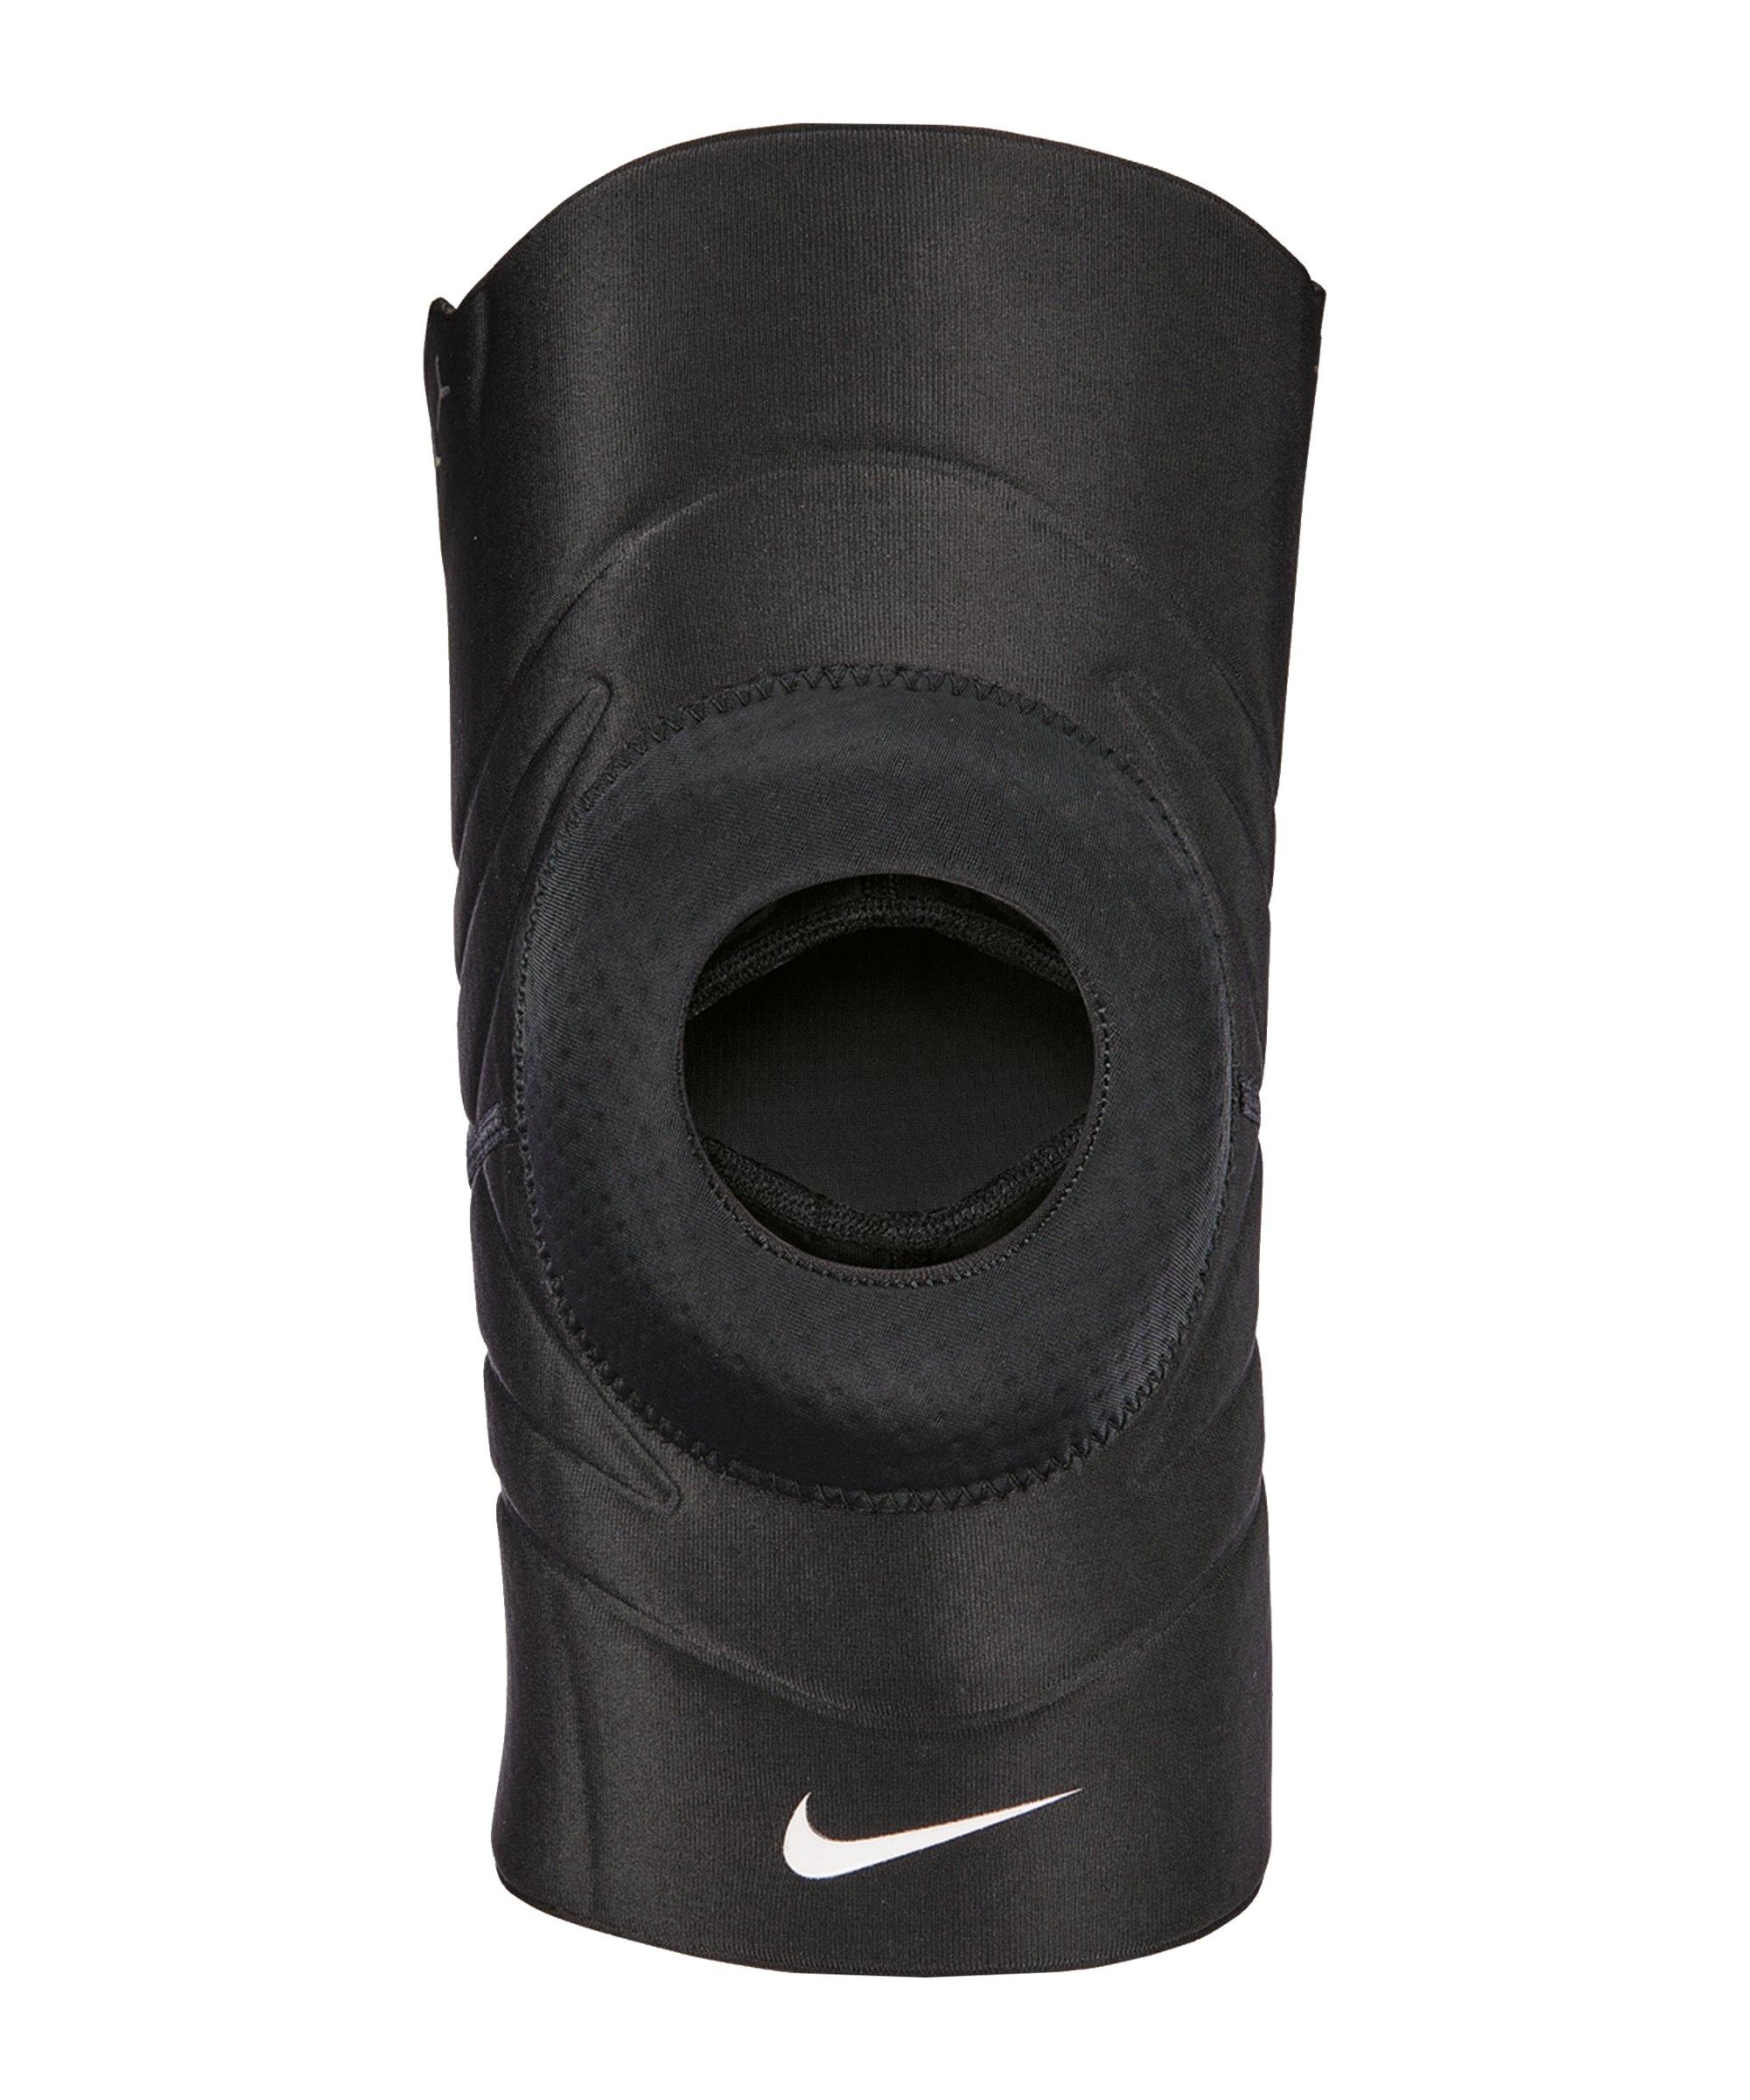 Nike Pro Open Patella Knee Sleeve 3.0 Schwarz F010 - schwarz